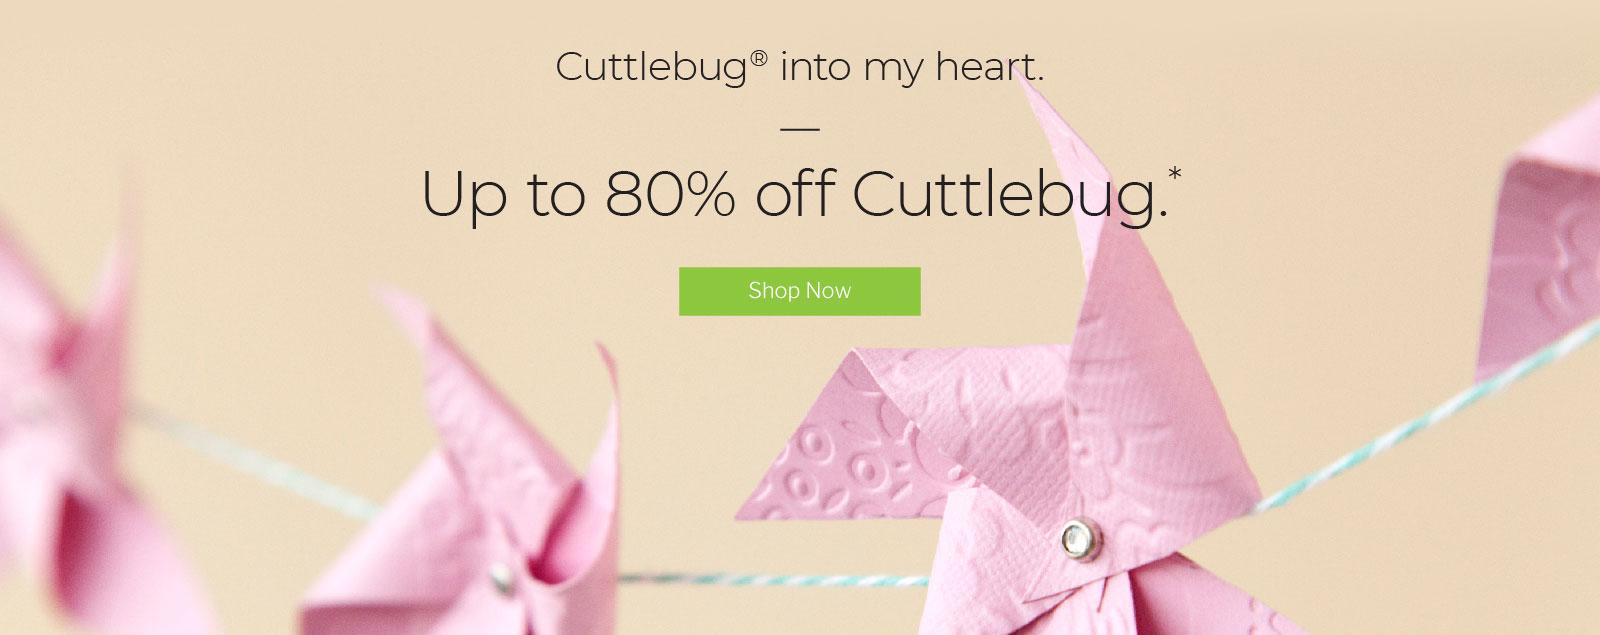 Cricut: Access Exclusive Cuttlebug Sale! - Lovin' the Prize of Life